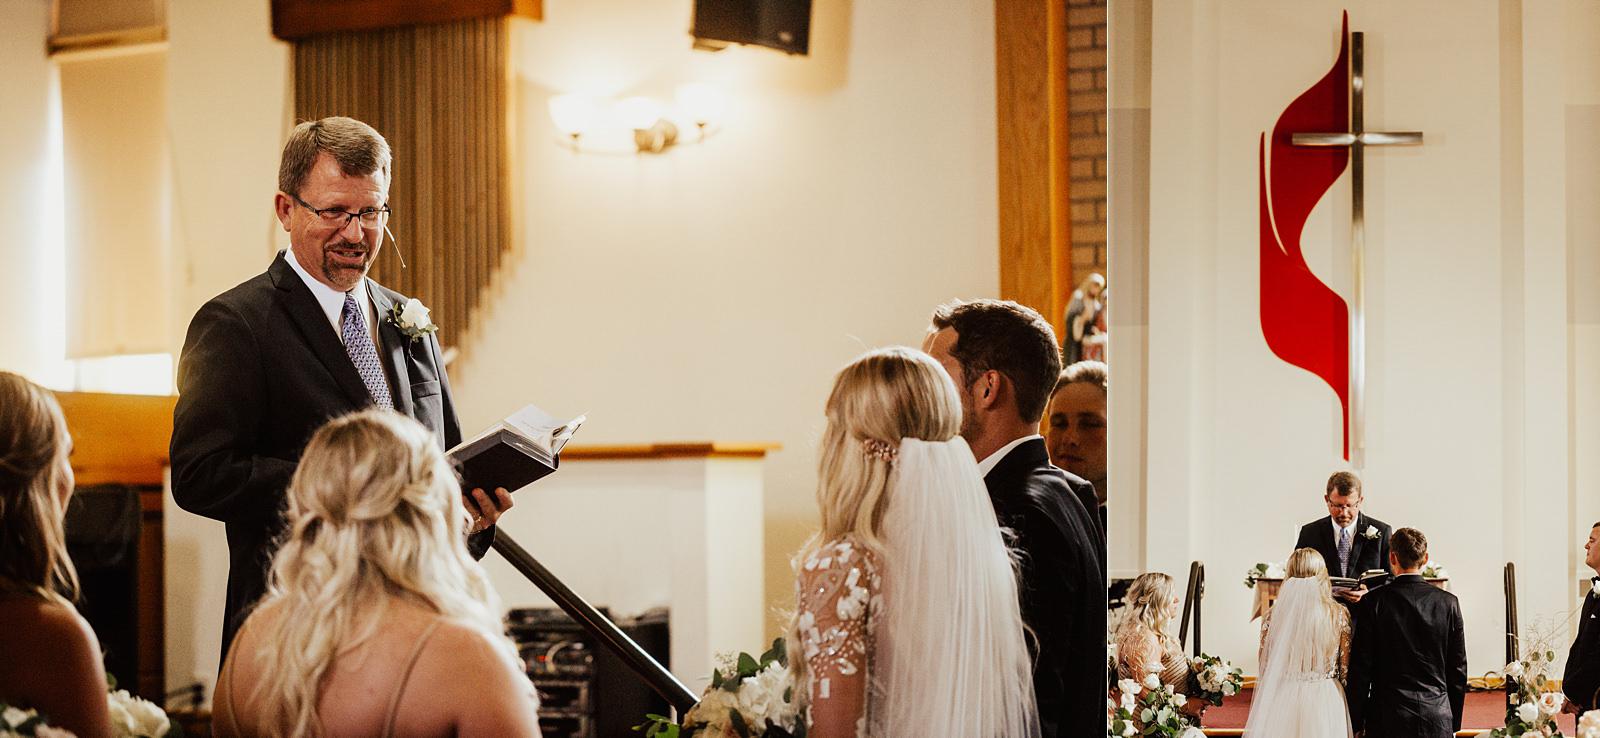 Molly & Bradley Modern Boho Wedding at The University Club Quad Cities-30.jpg